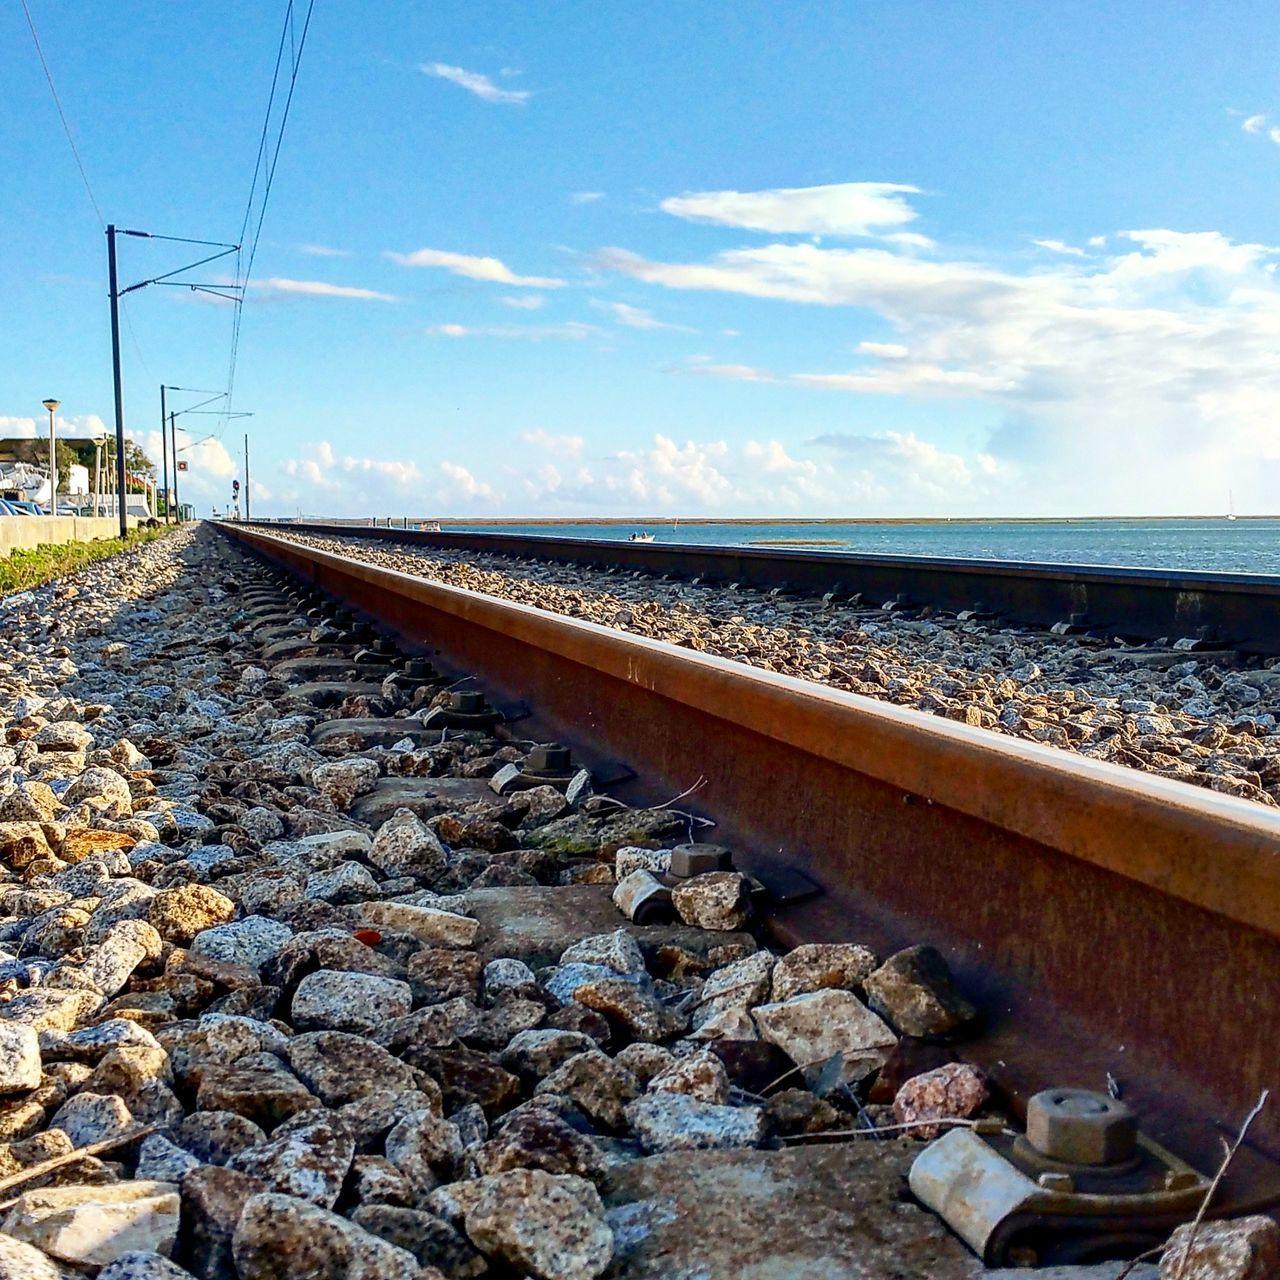 railroad track, rail transportation, sky, transportation, day, cloud - sky, no people, outdoors, nature